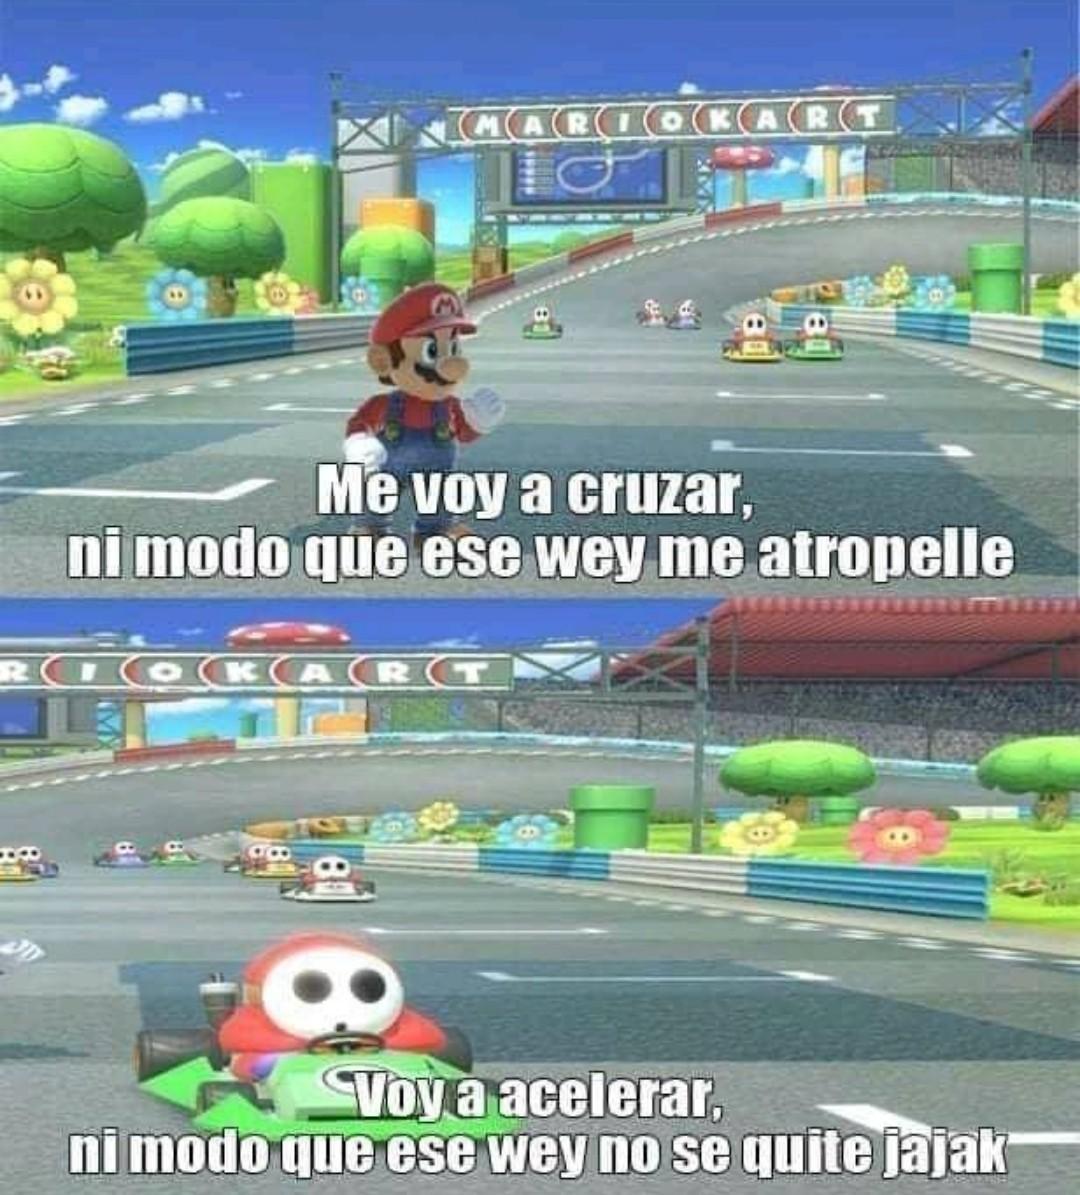 Latinoamérica be like - meme